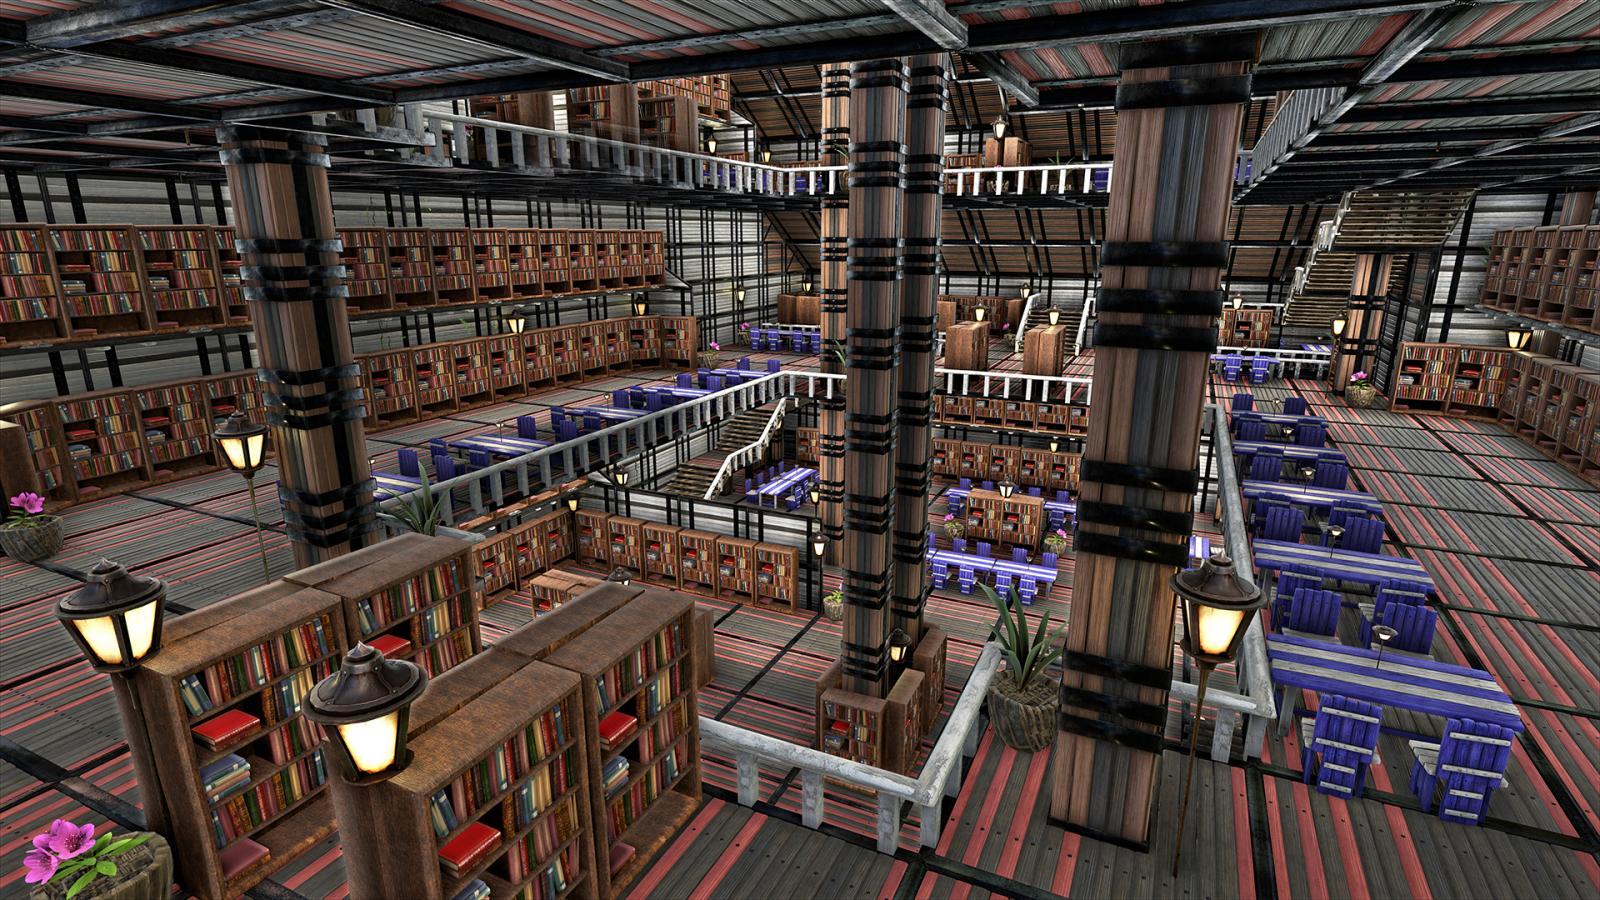 large.58a7b11aee892_WolfAngelus-Library1-8x.jpg